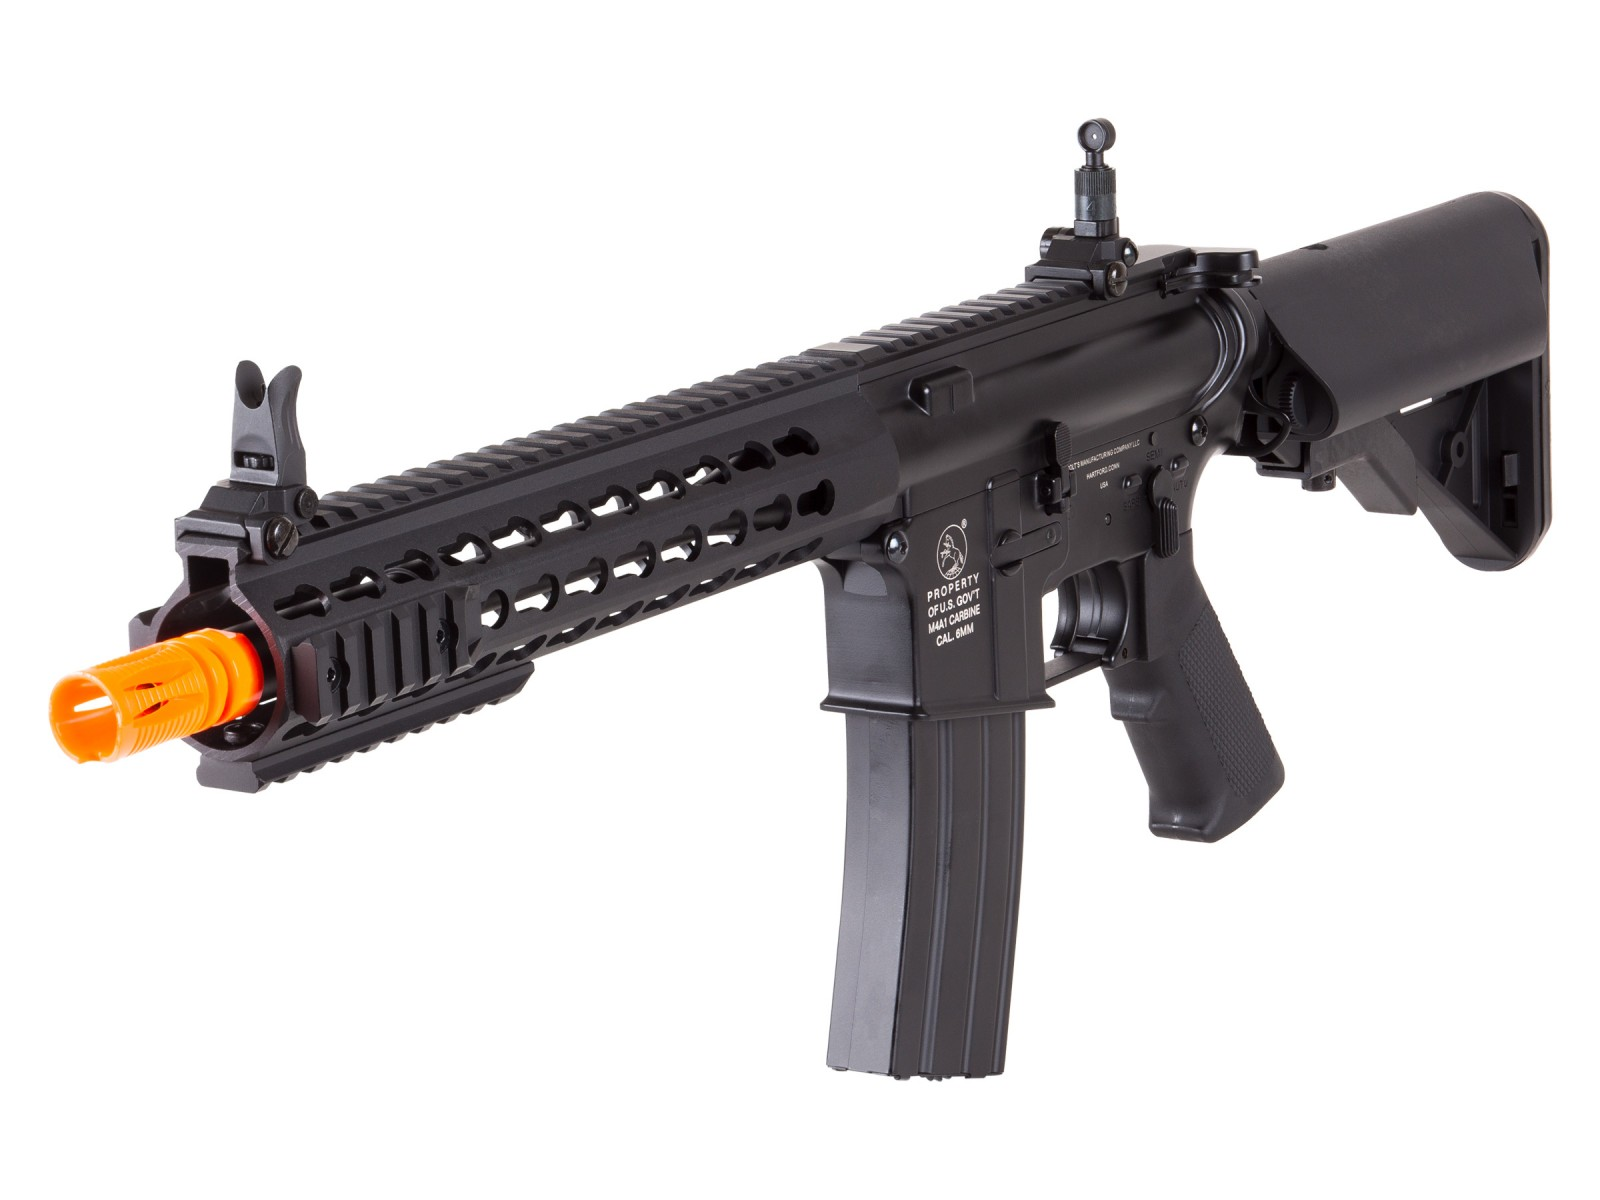 Colt M4A1 Short Keymod Full Metal AEG Rifle, Black